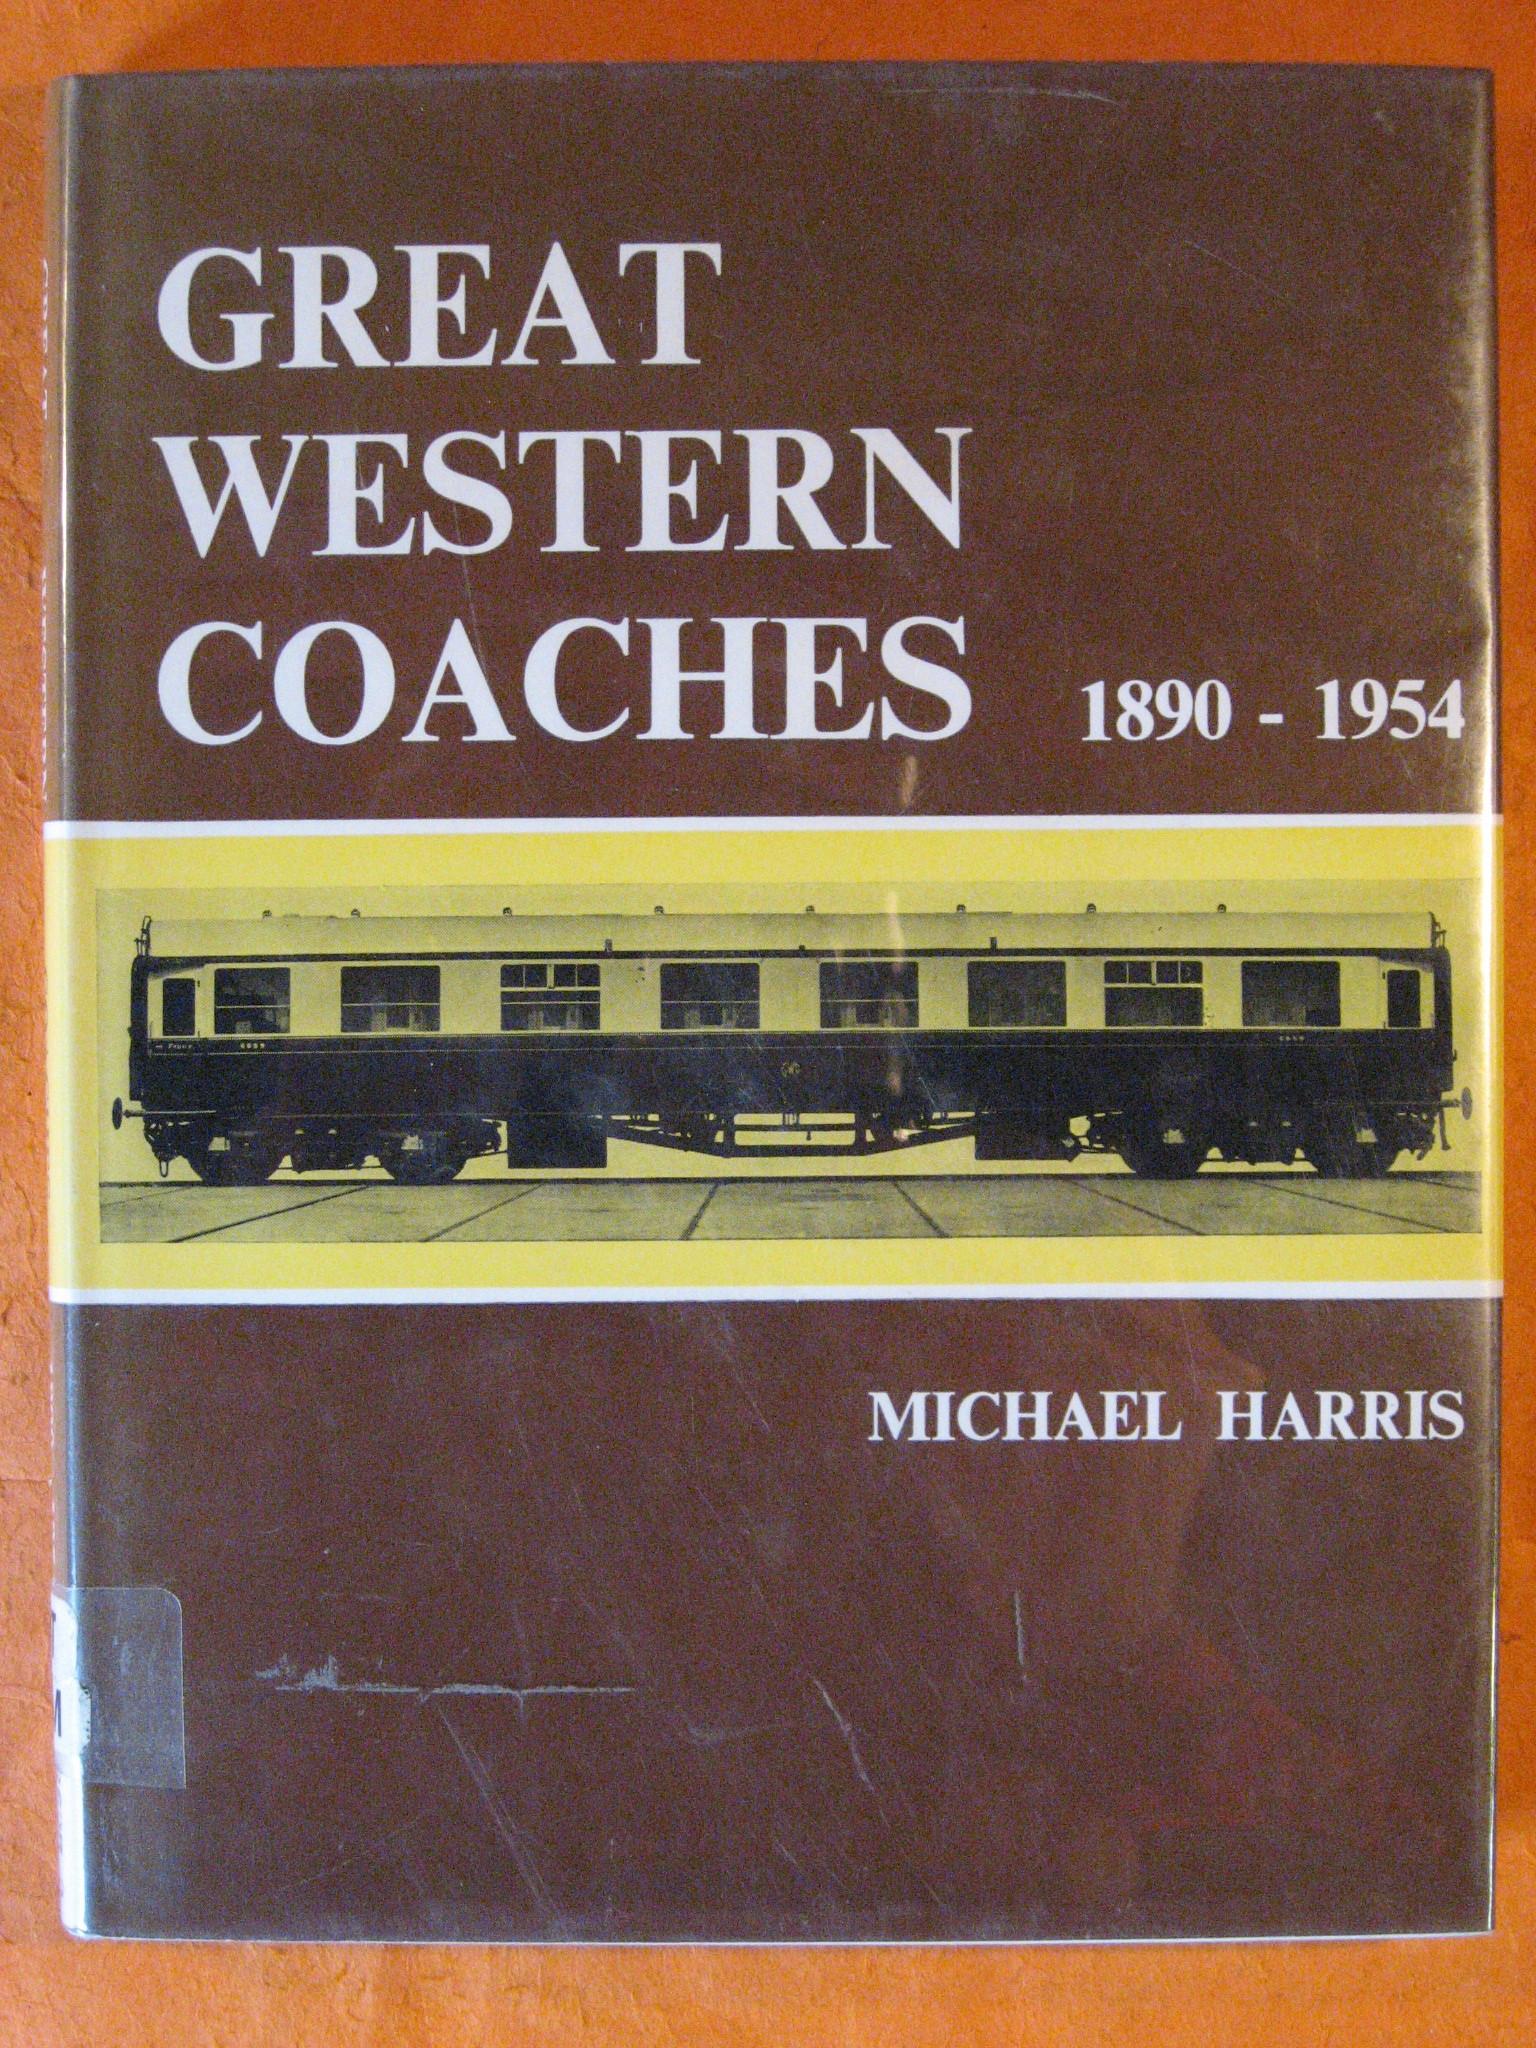 Great Western Coaches, 1890-1954 (David & Charles locomotive monographs), Harris, Michael